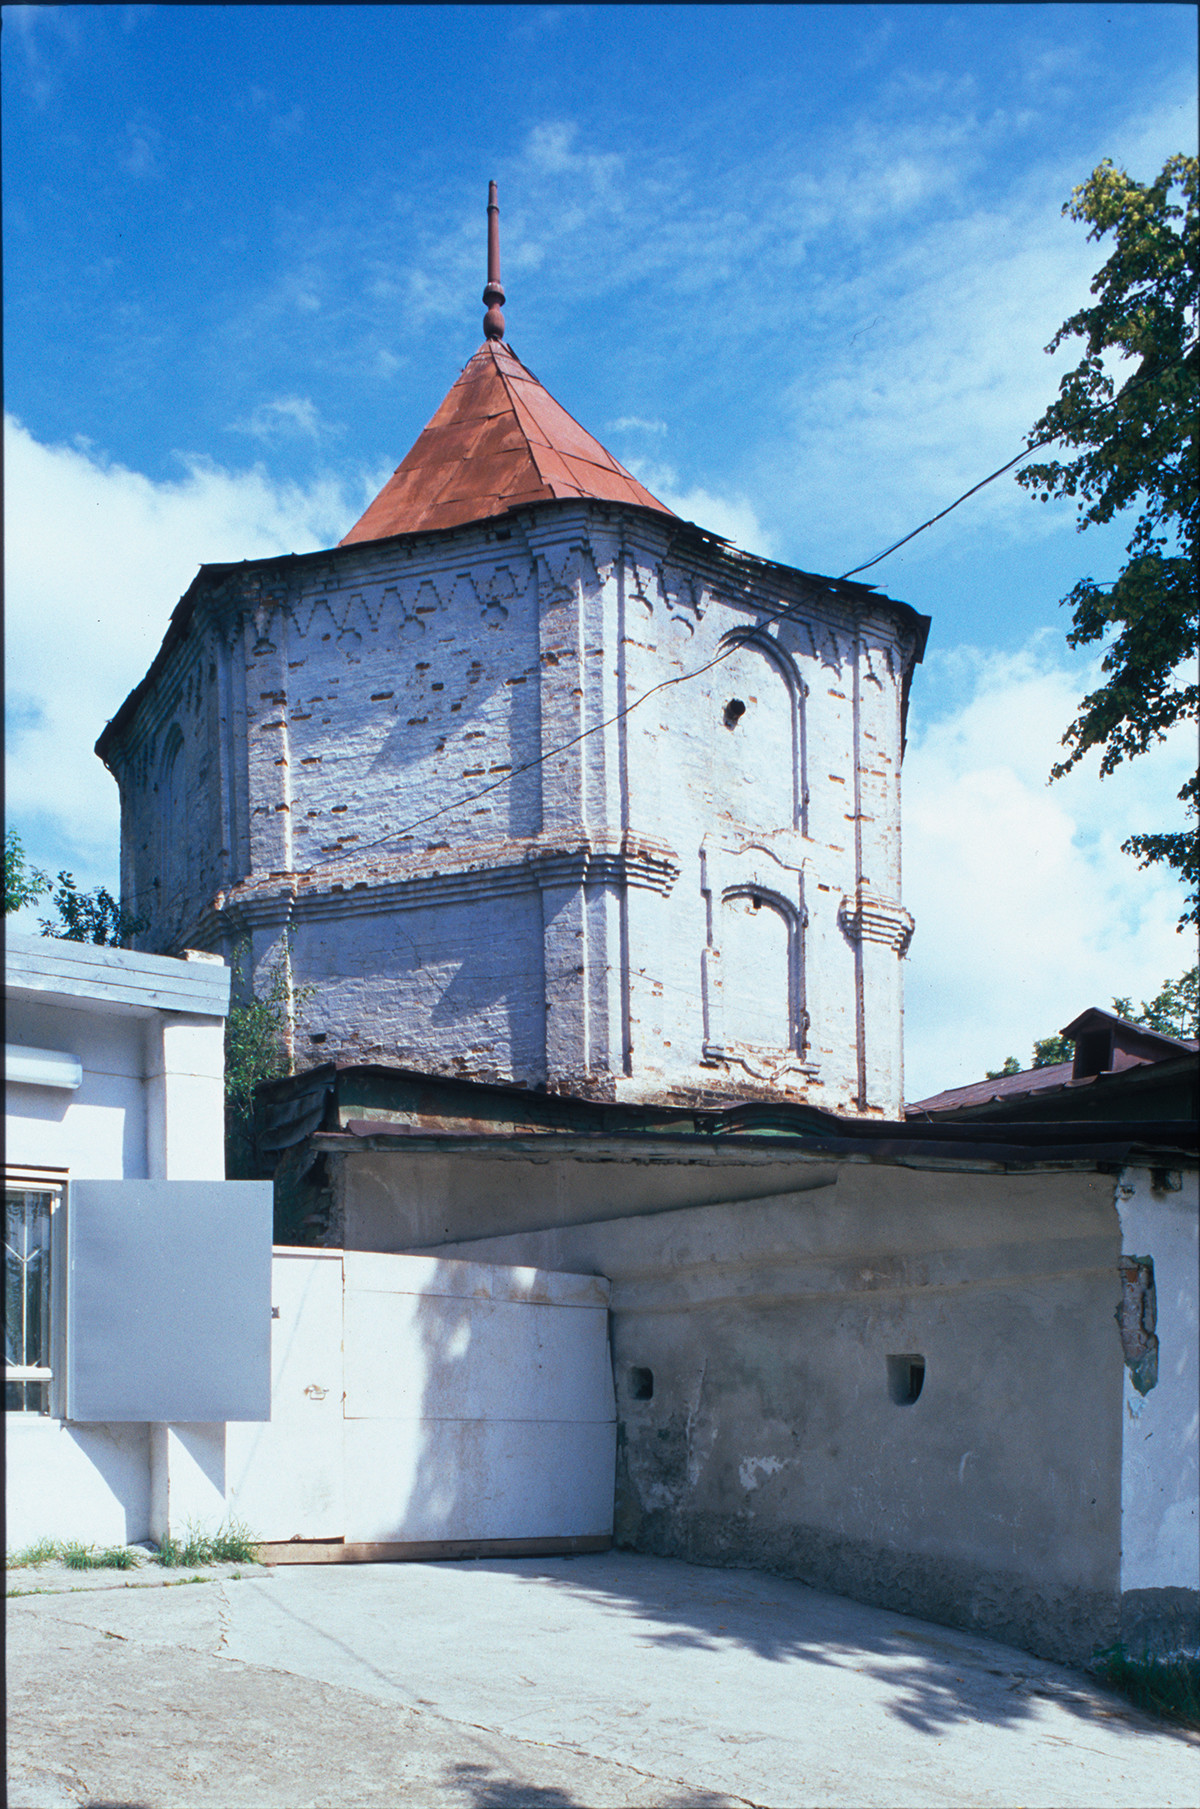 Stolp na nekdanjem posestvu Demidovih v Kištimski tovarni. Zgrajen pb. 1760 po načrtih Nikite Demidova. 14. julij 2003.